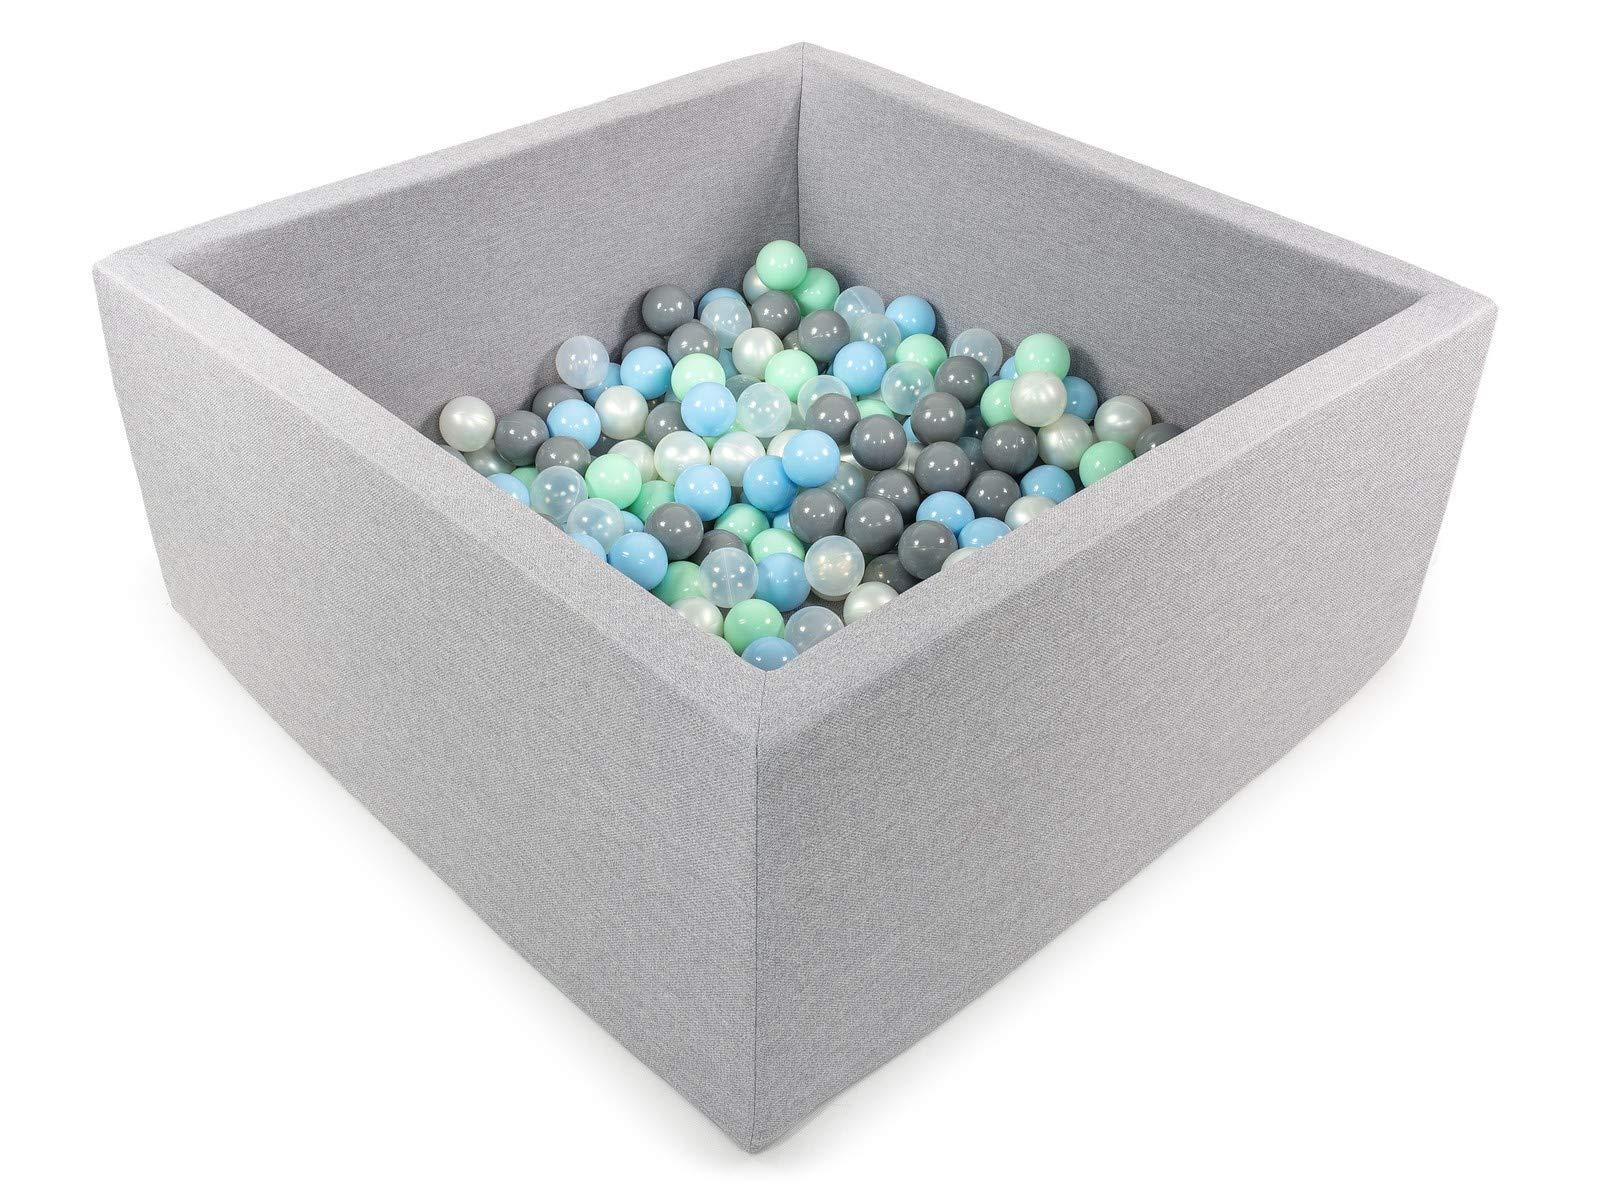 Tweepsy Soft Baby Ball Square Pool Pit 250 Balls 90x90x40cm Handmade EU - BKWZ1 by Tweepsy